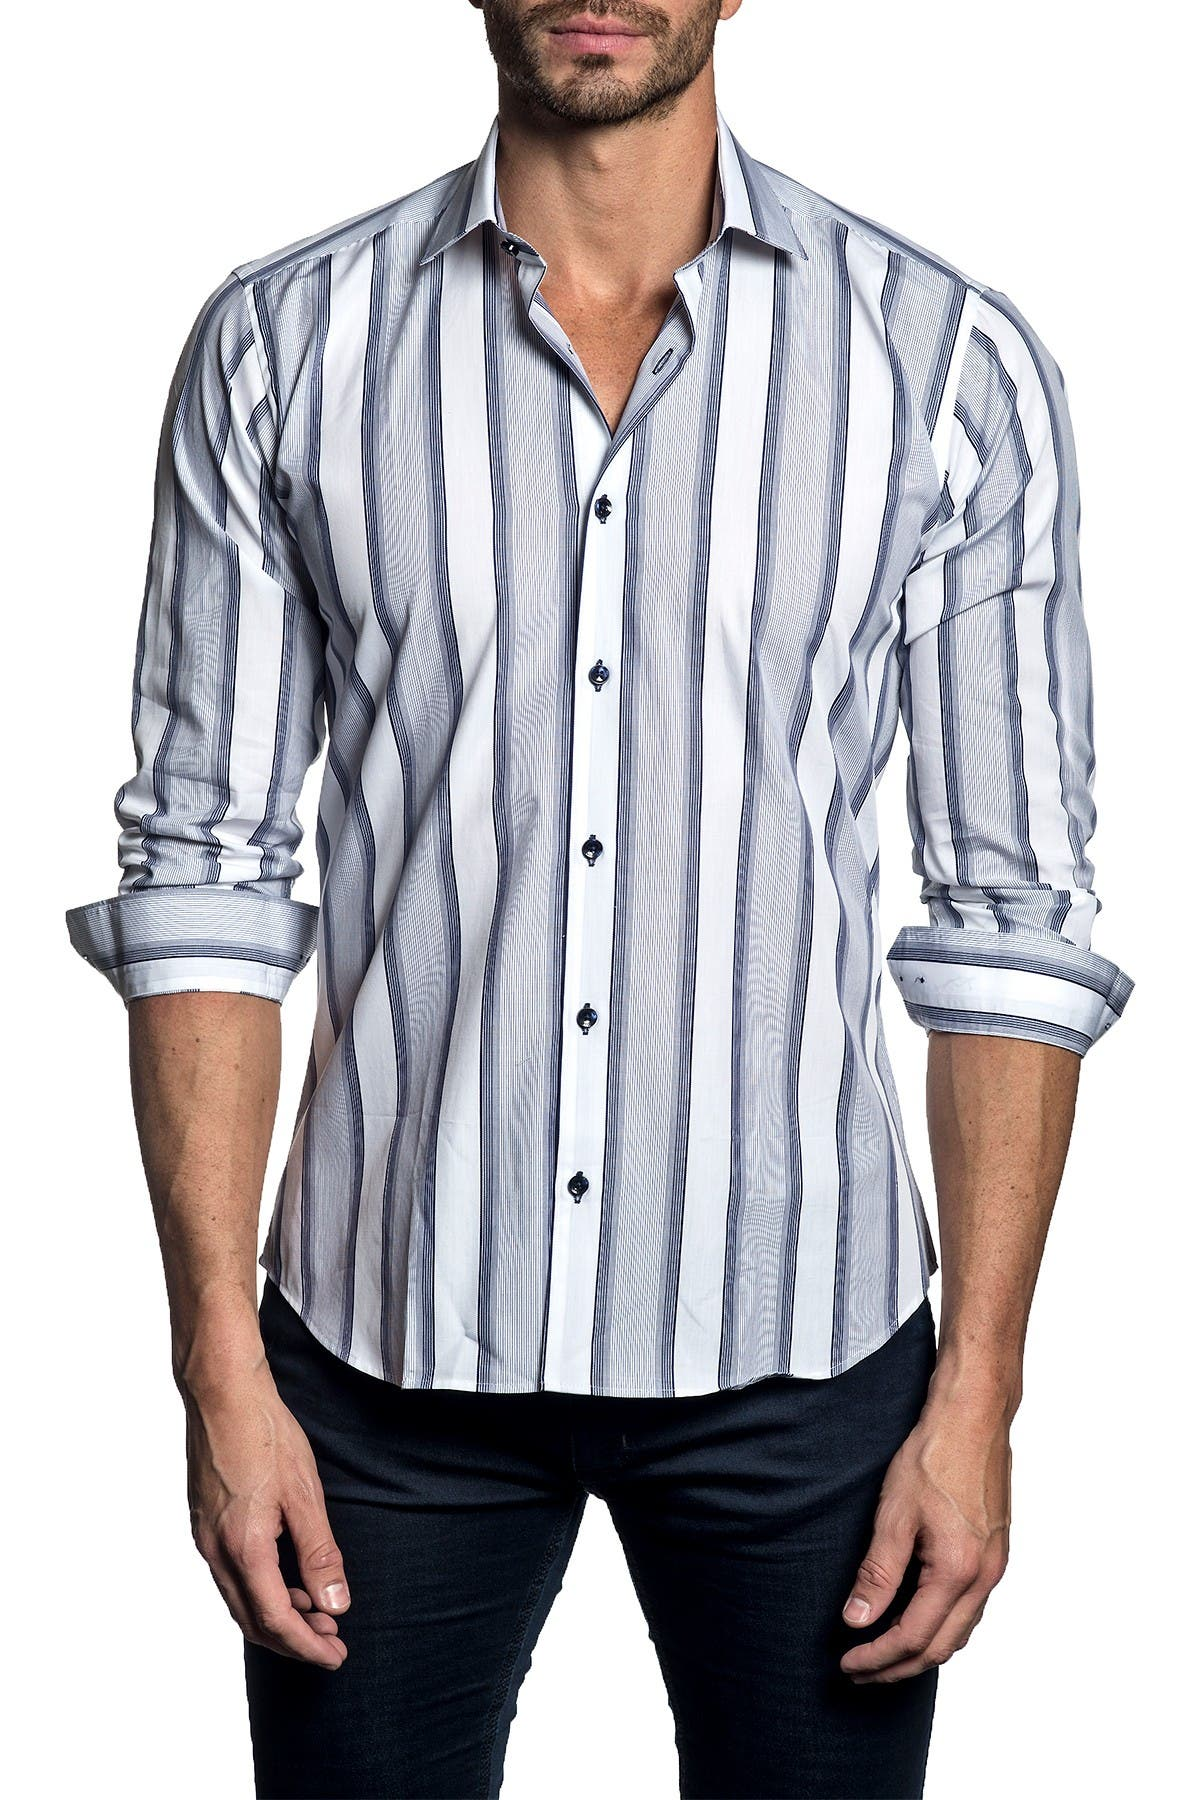 Image of Jared Lang Long Sleeve Stripe Trim Fit Woven Shirt